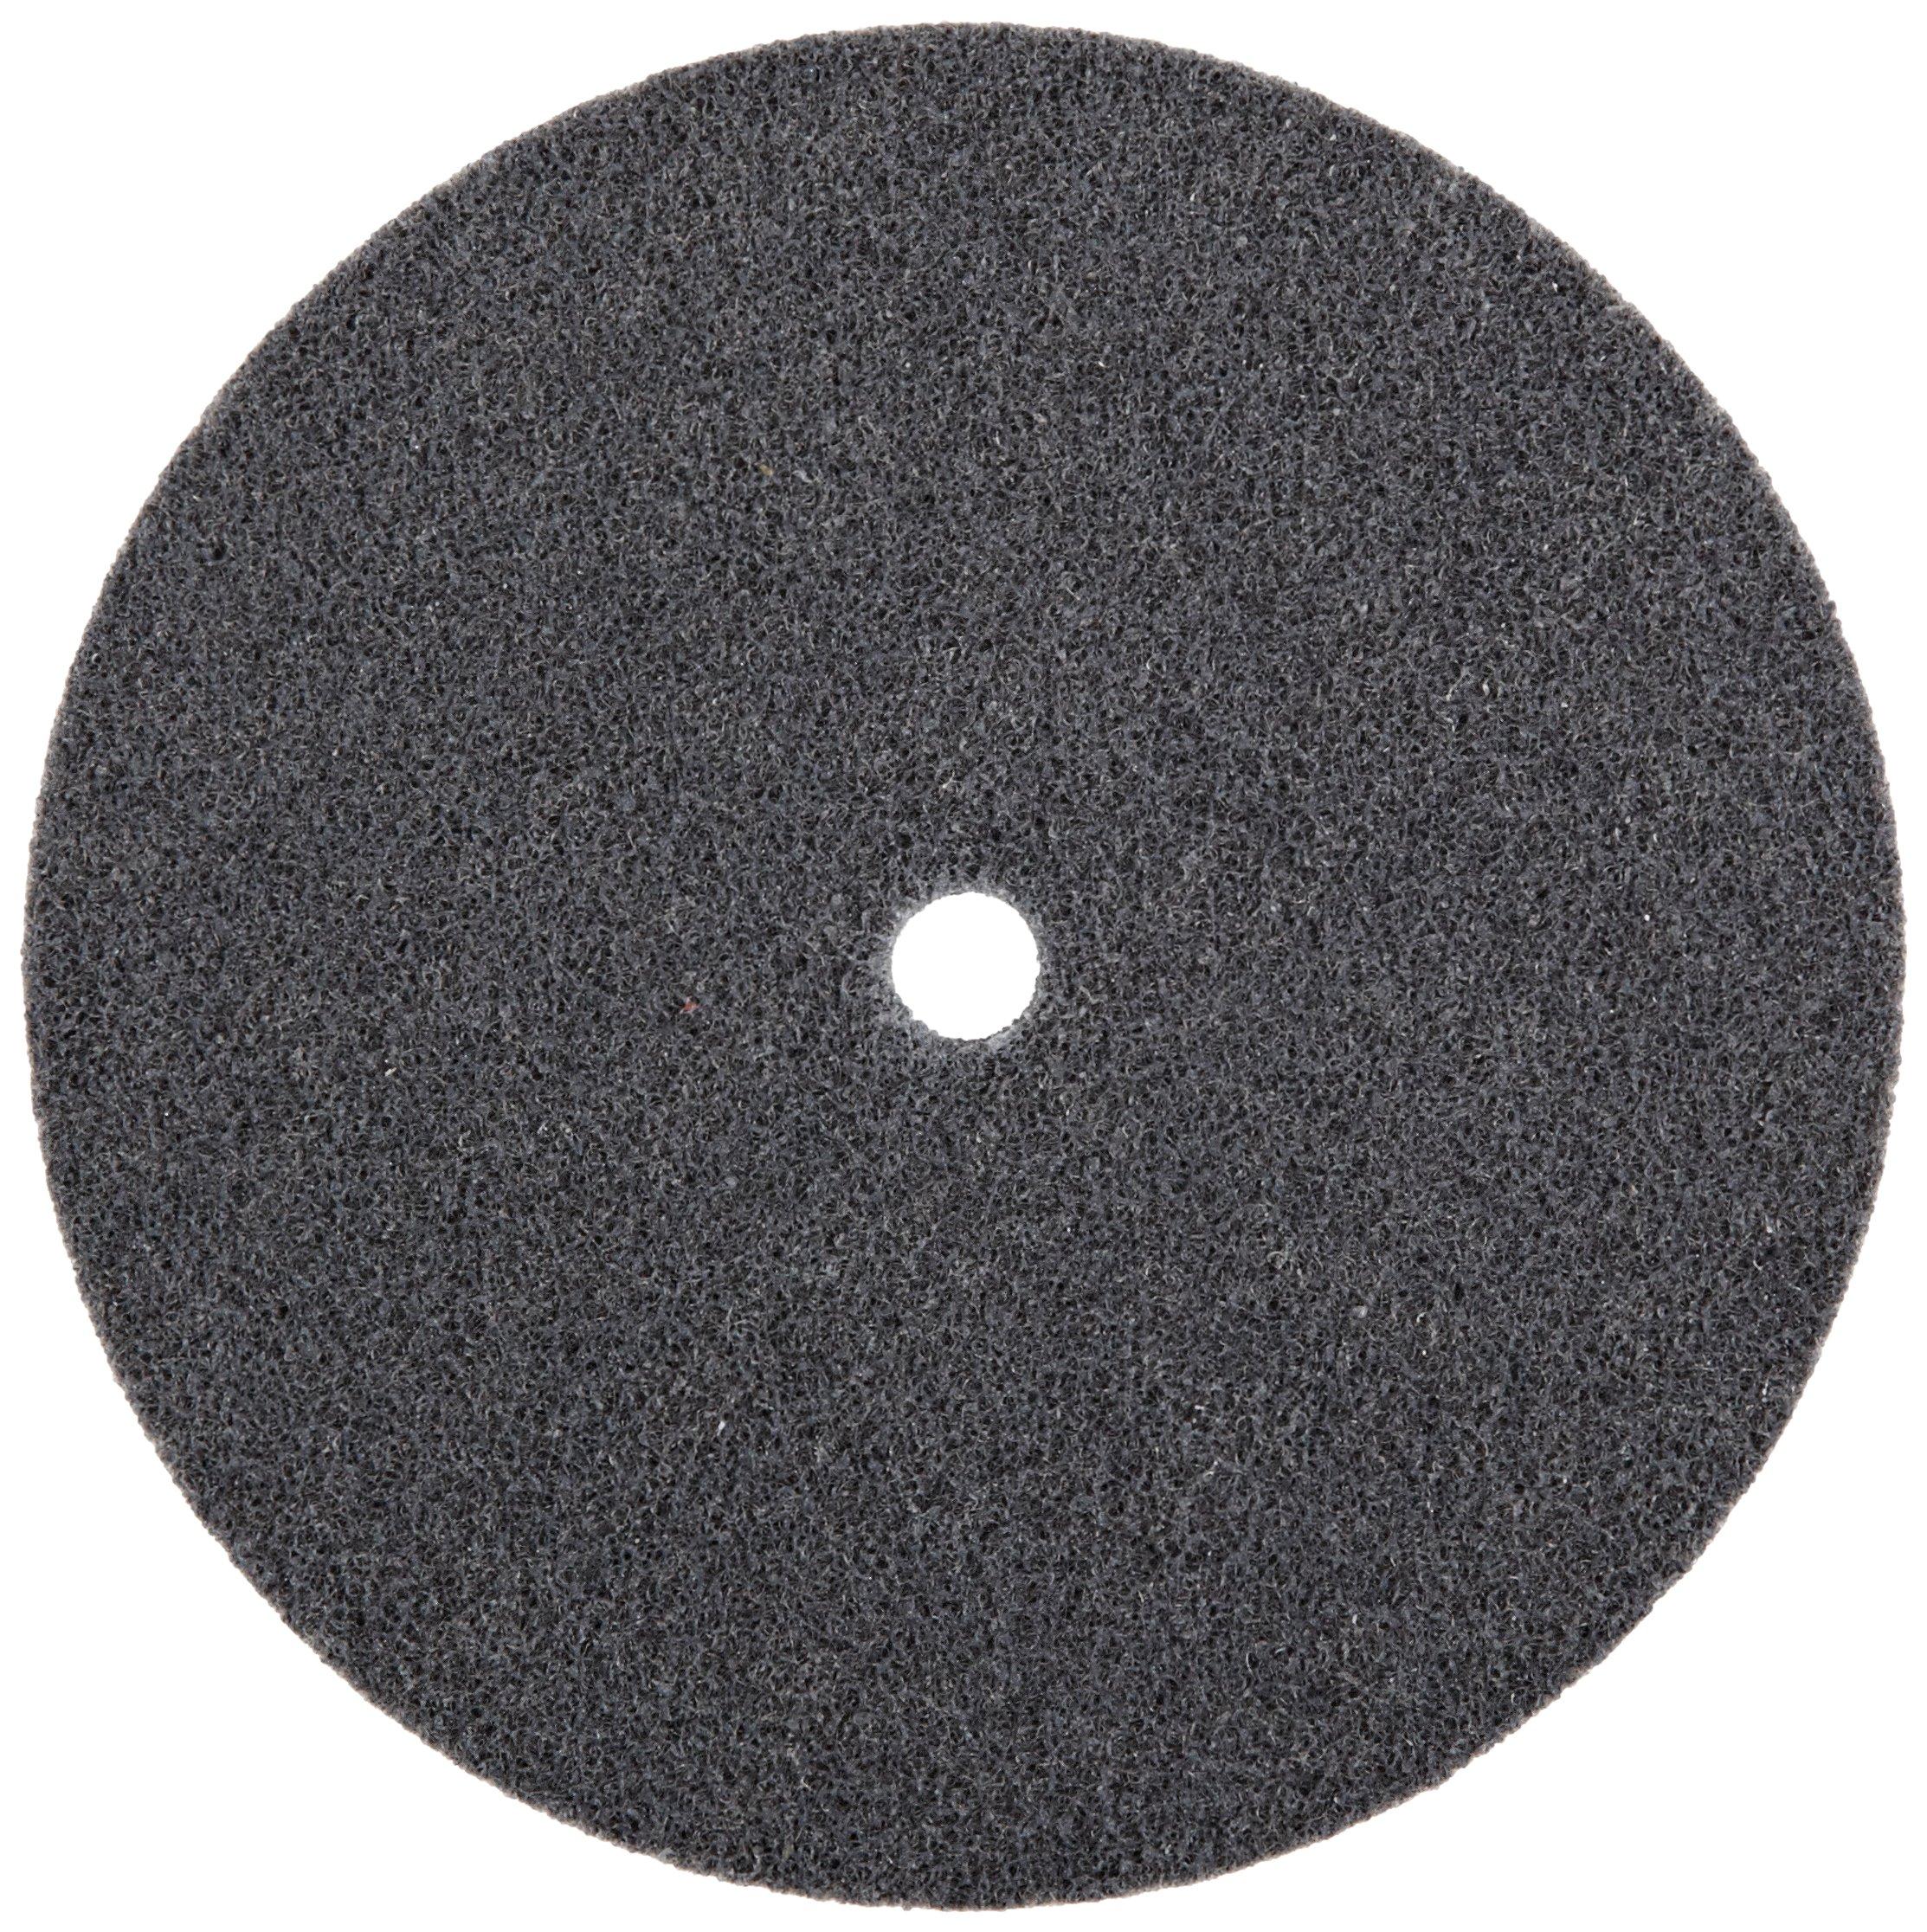 Scotch-Brite(TM) EXL Unitized Wheel, Silicon Carbide, 5000 rpm, 6 Diameter, 1/2 Arbor, 2S Fine Grit  (Pack of 4)